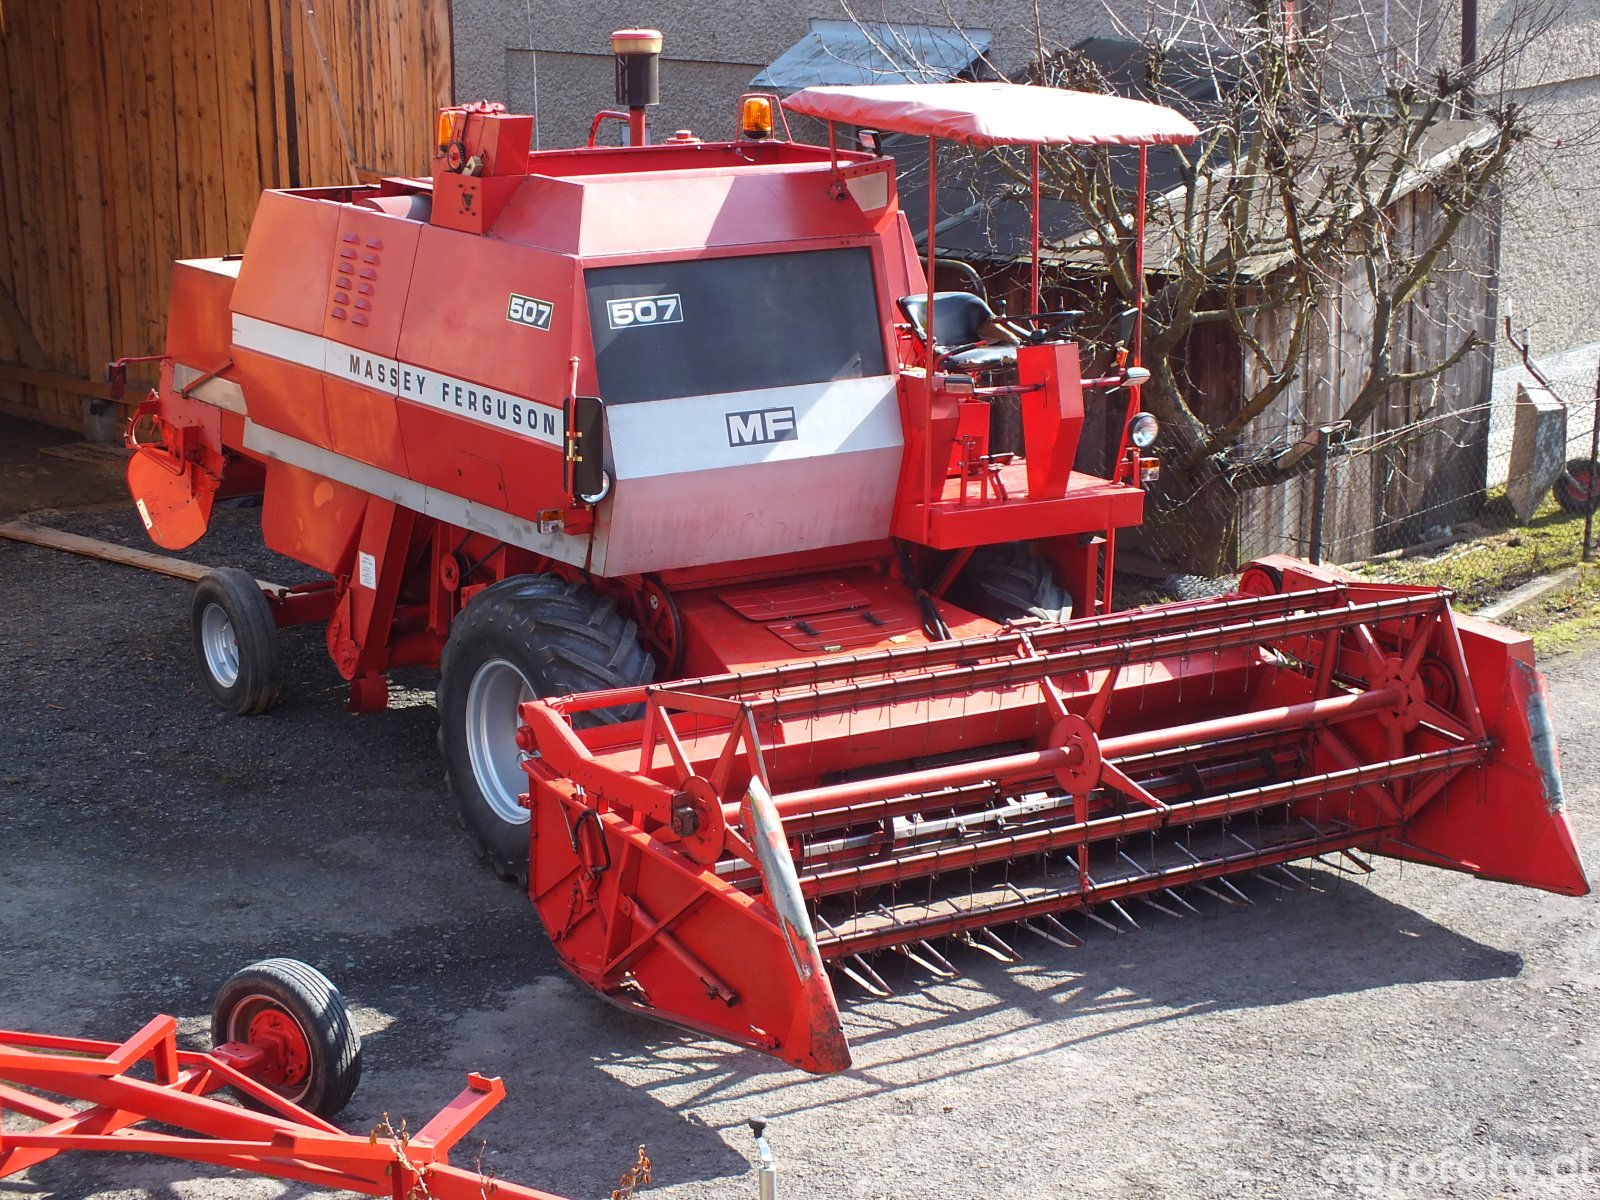 MF 507